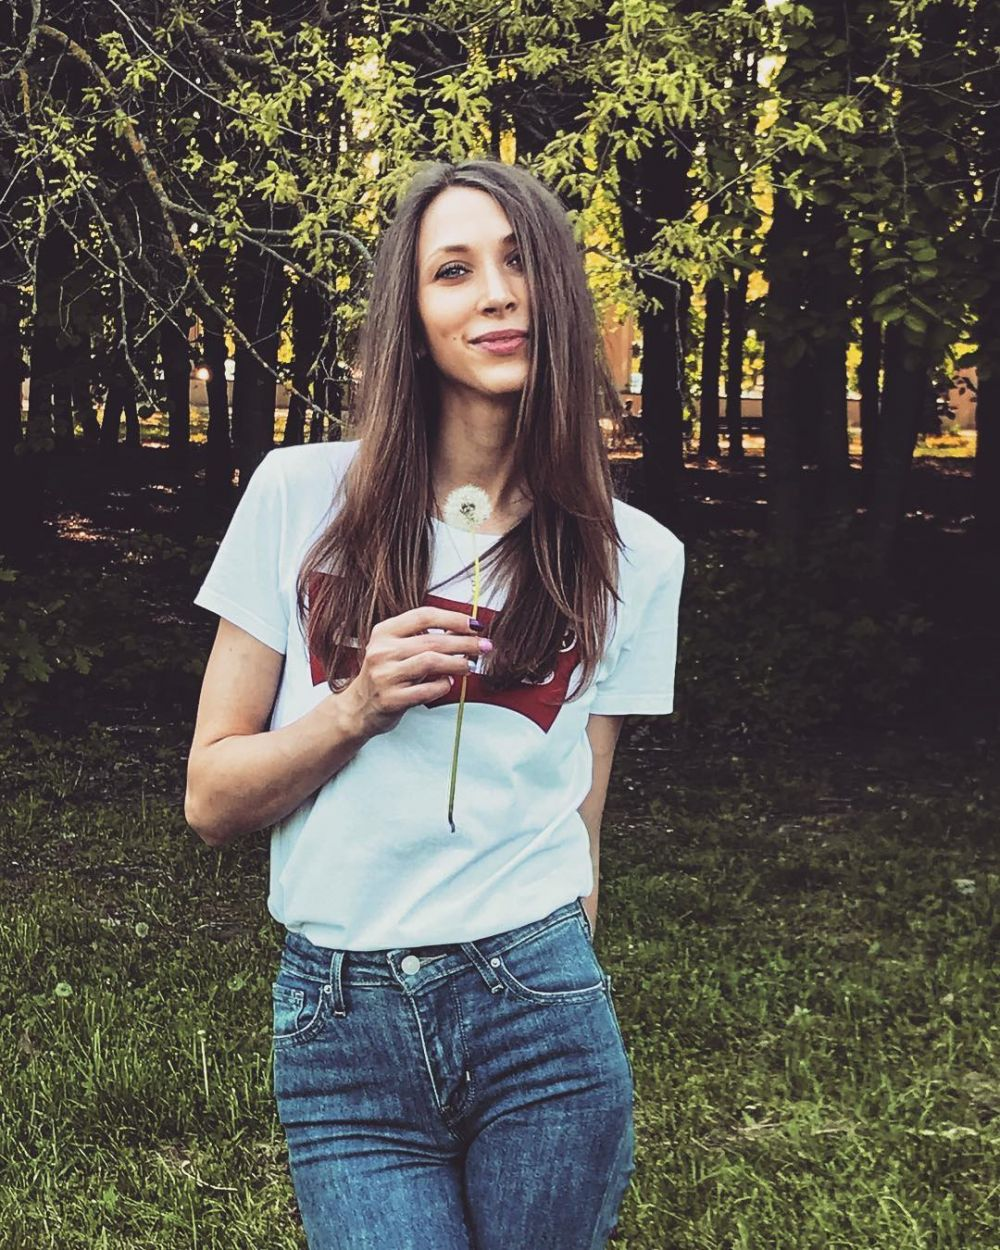 Алина Колесникова, управляющий магазина.